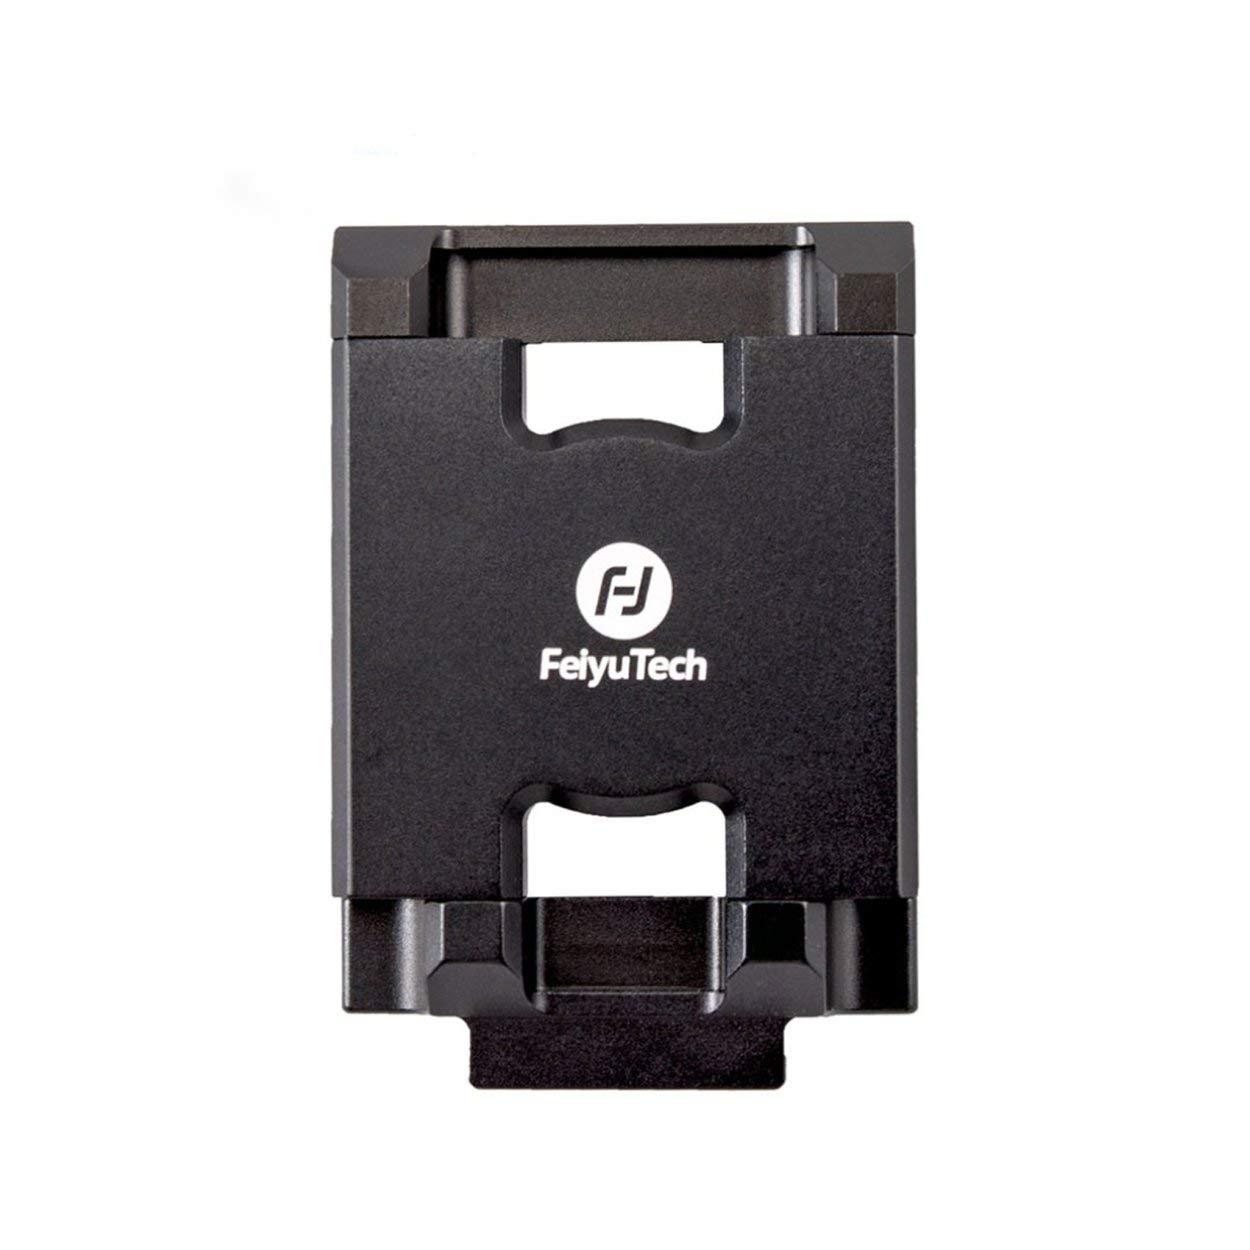 KMtar Feiyu 携帯電話ホルダー マウント ブラケット クリップ アダプター Feiyu G6 Plus アクションカメラ ジンバル クランプ ホルダー iPhone X用   B07QM7GPSN